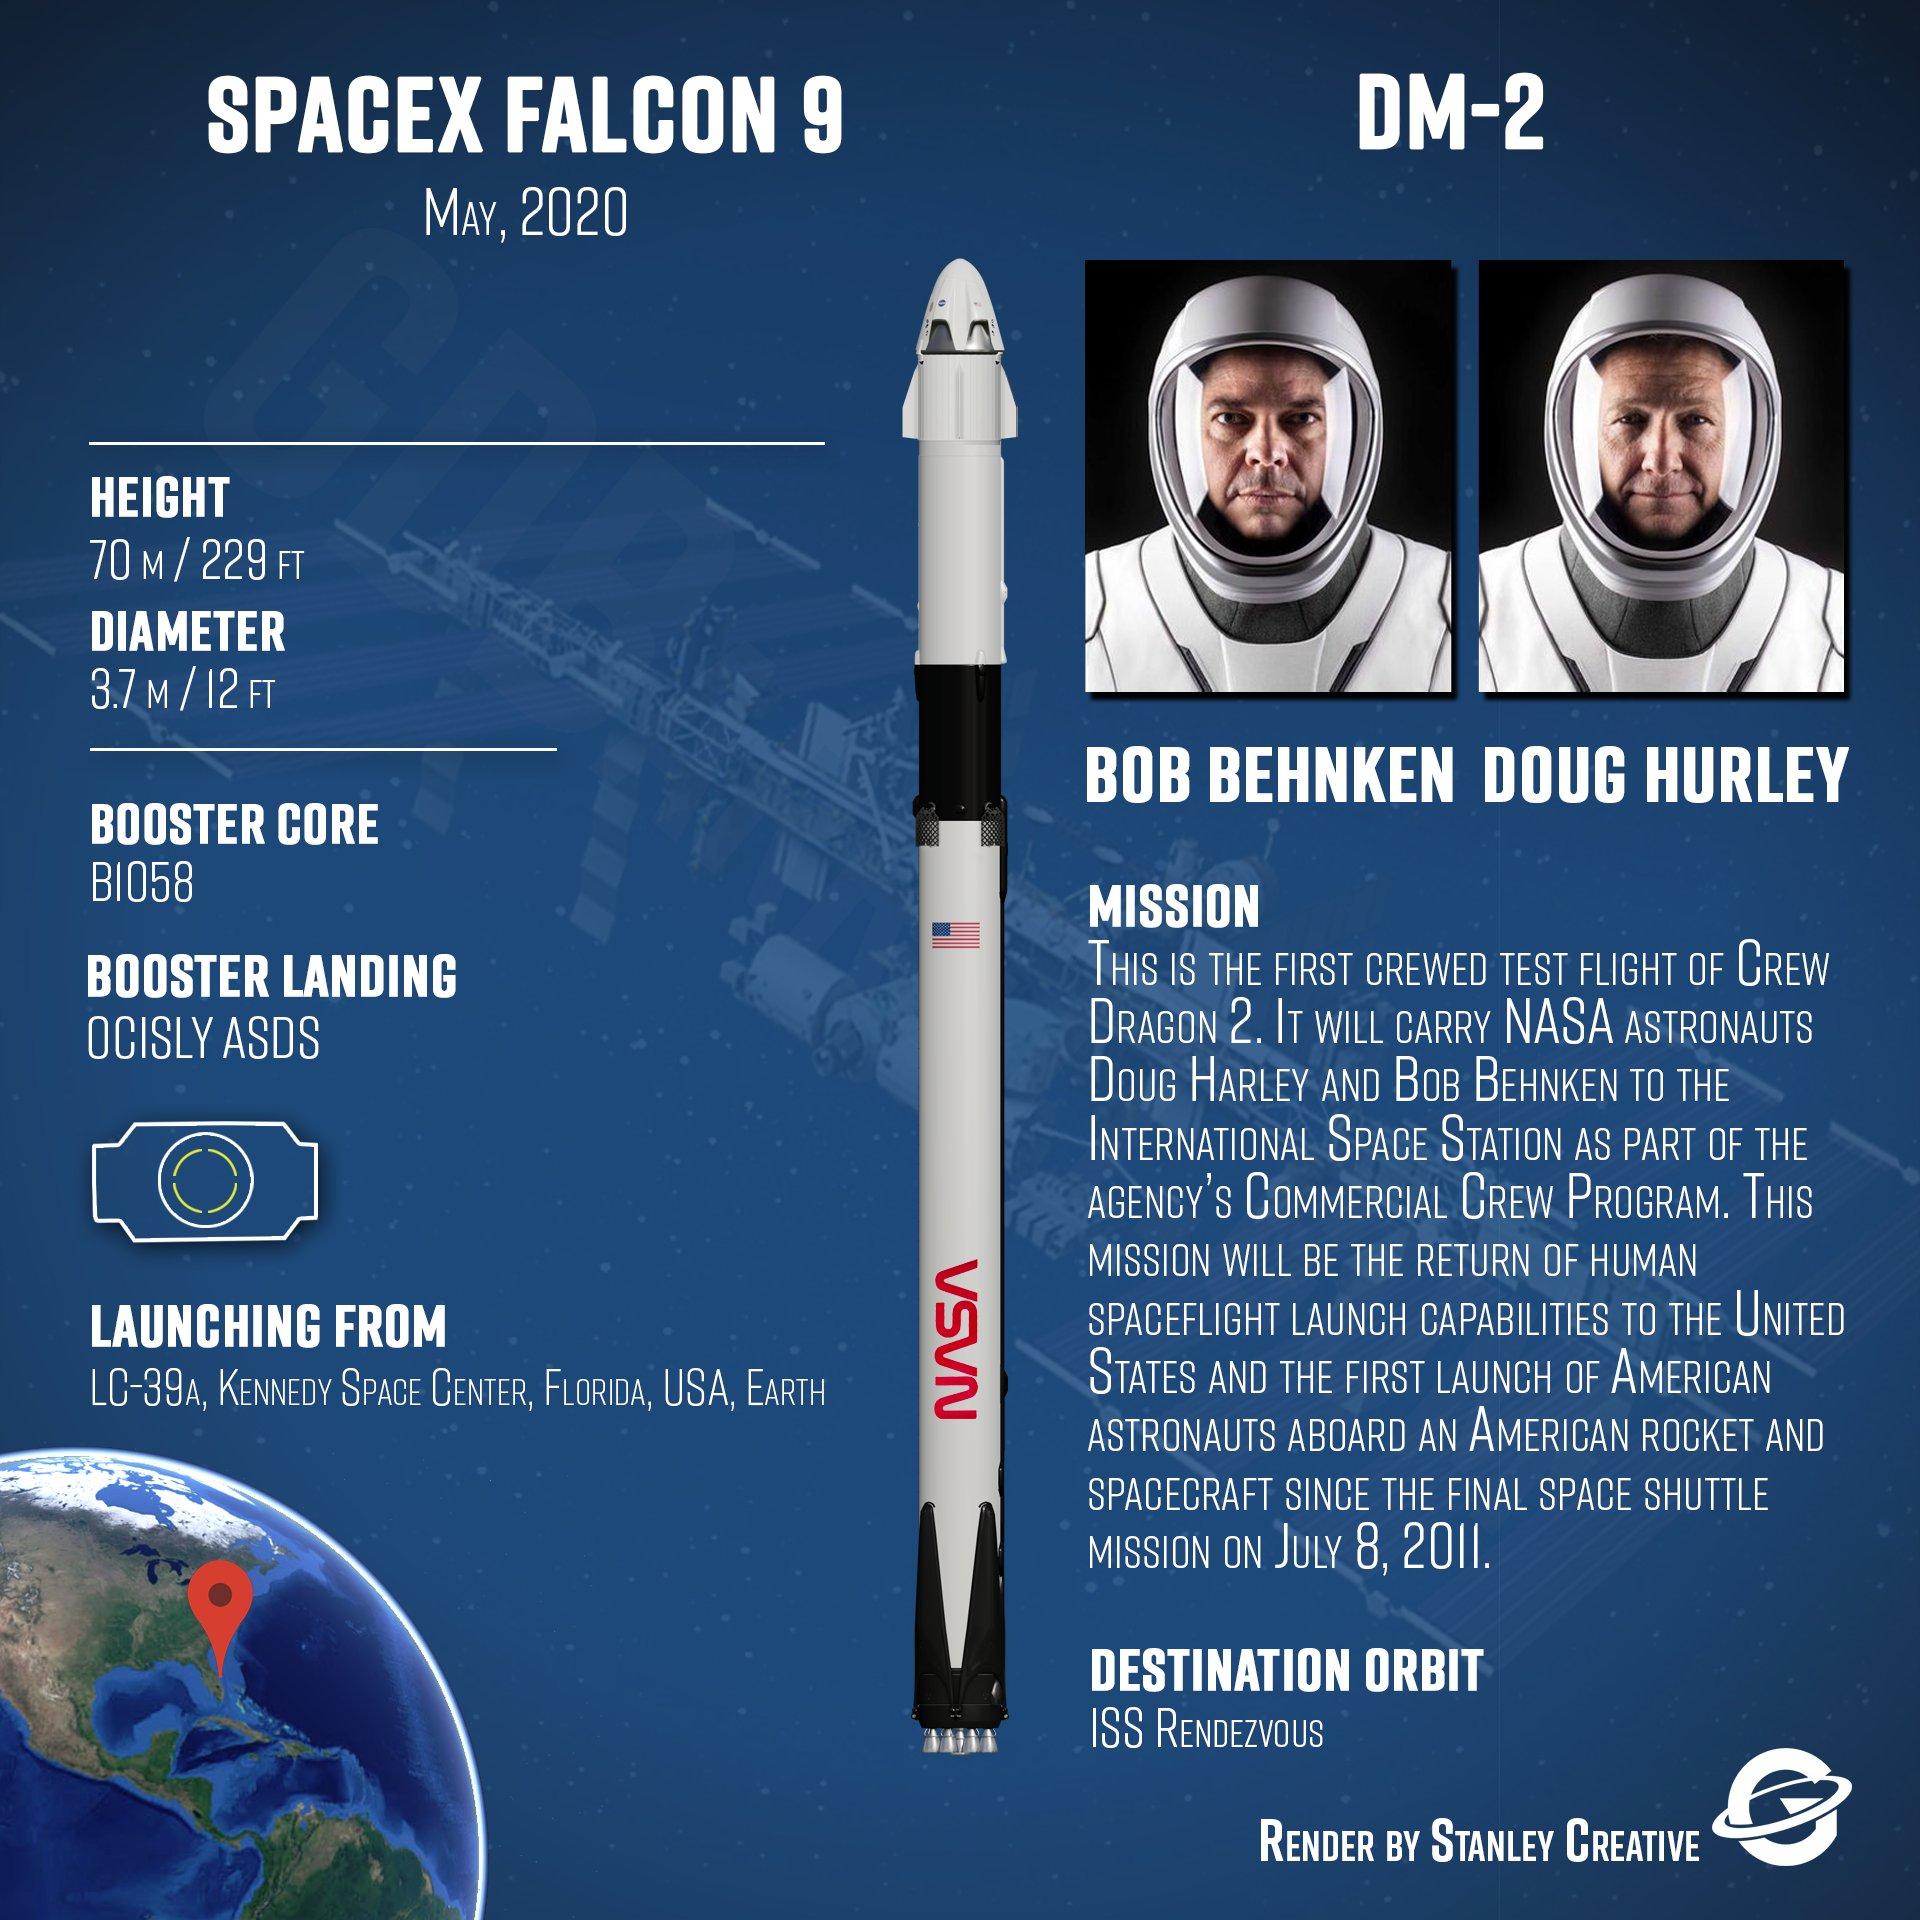 Falcon 9 (Dragon 2 Demo-2) - KSC - 30.5.2020 (1/2) - Page 7 EUn13QJXgAEuULX?format=jpg&name=large